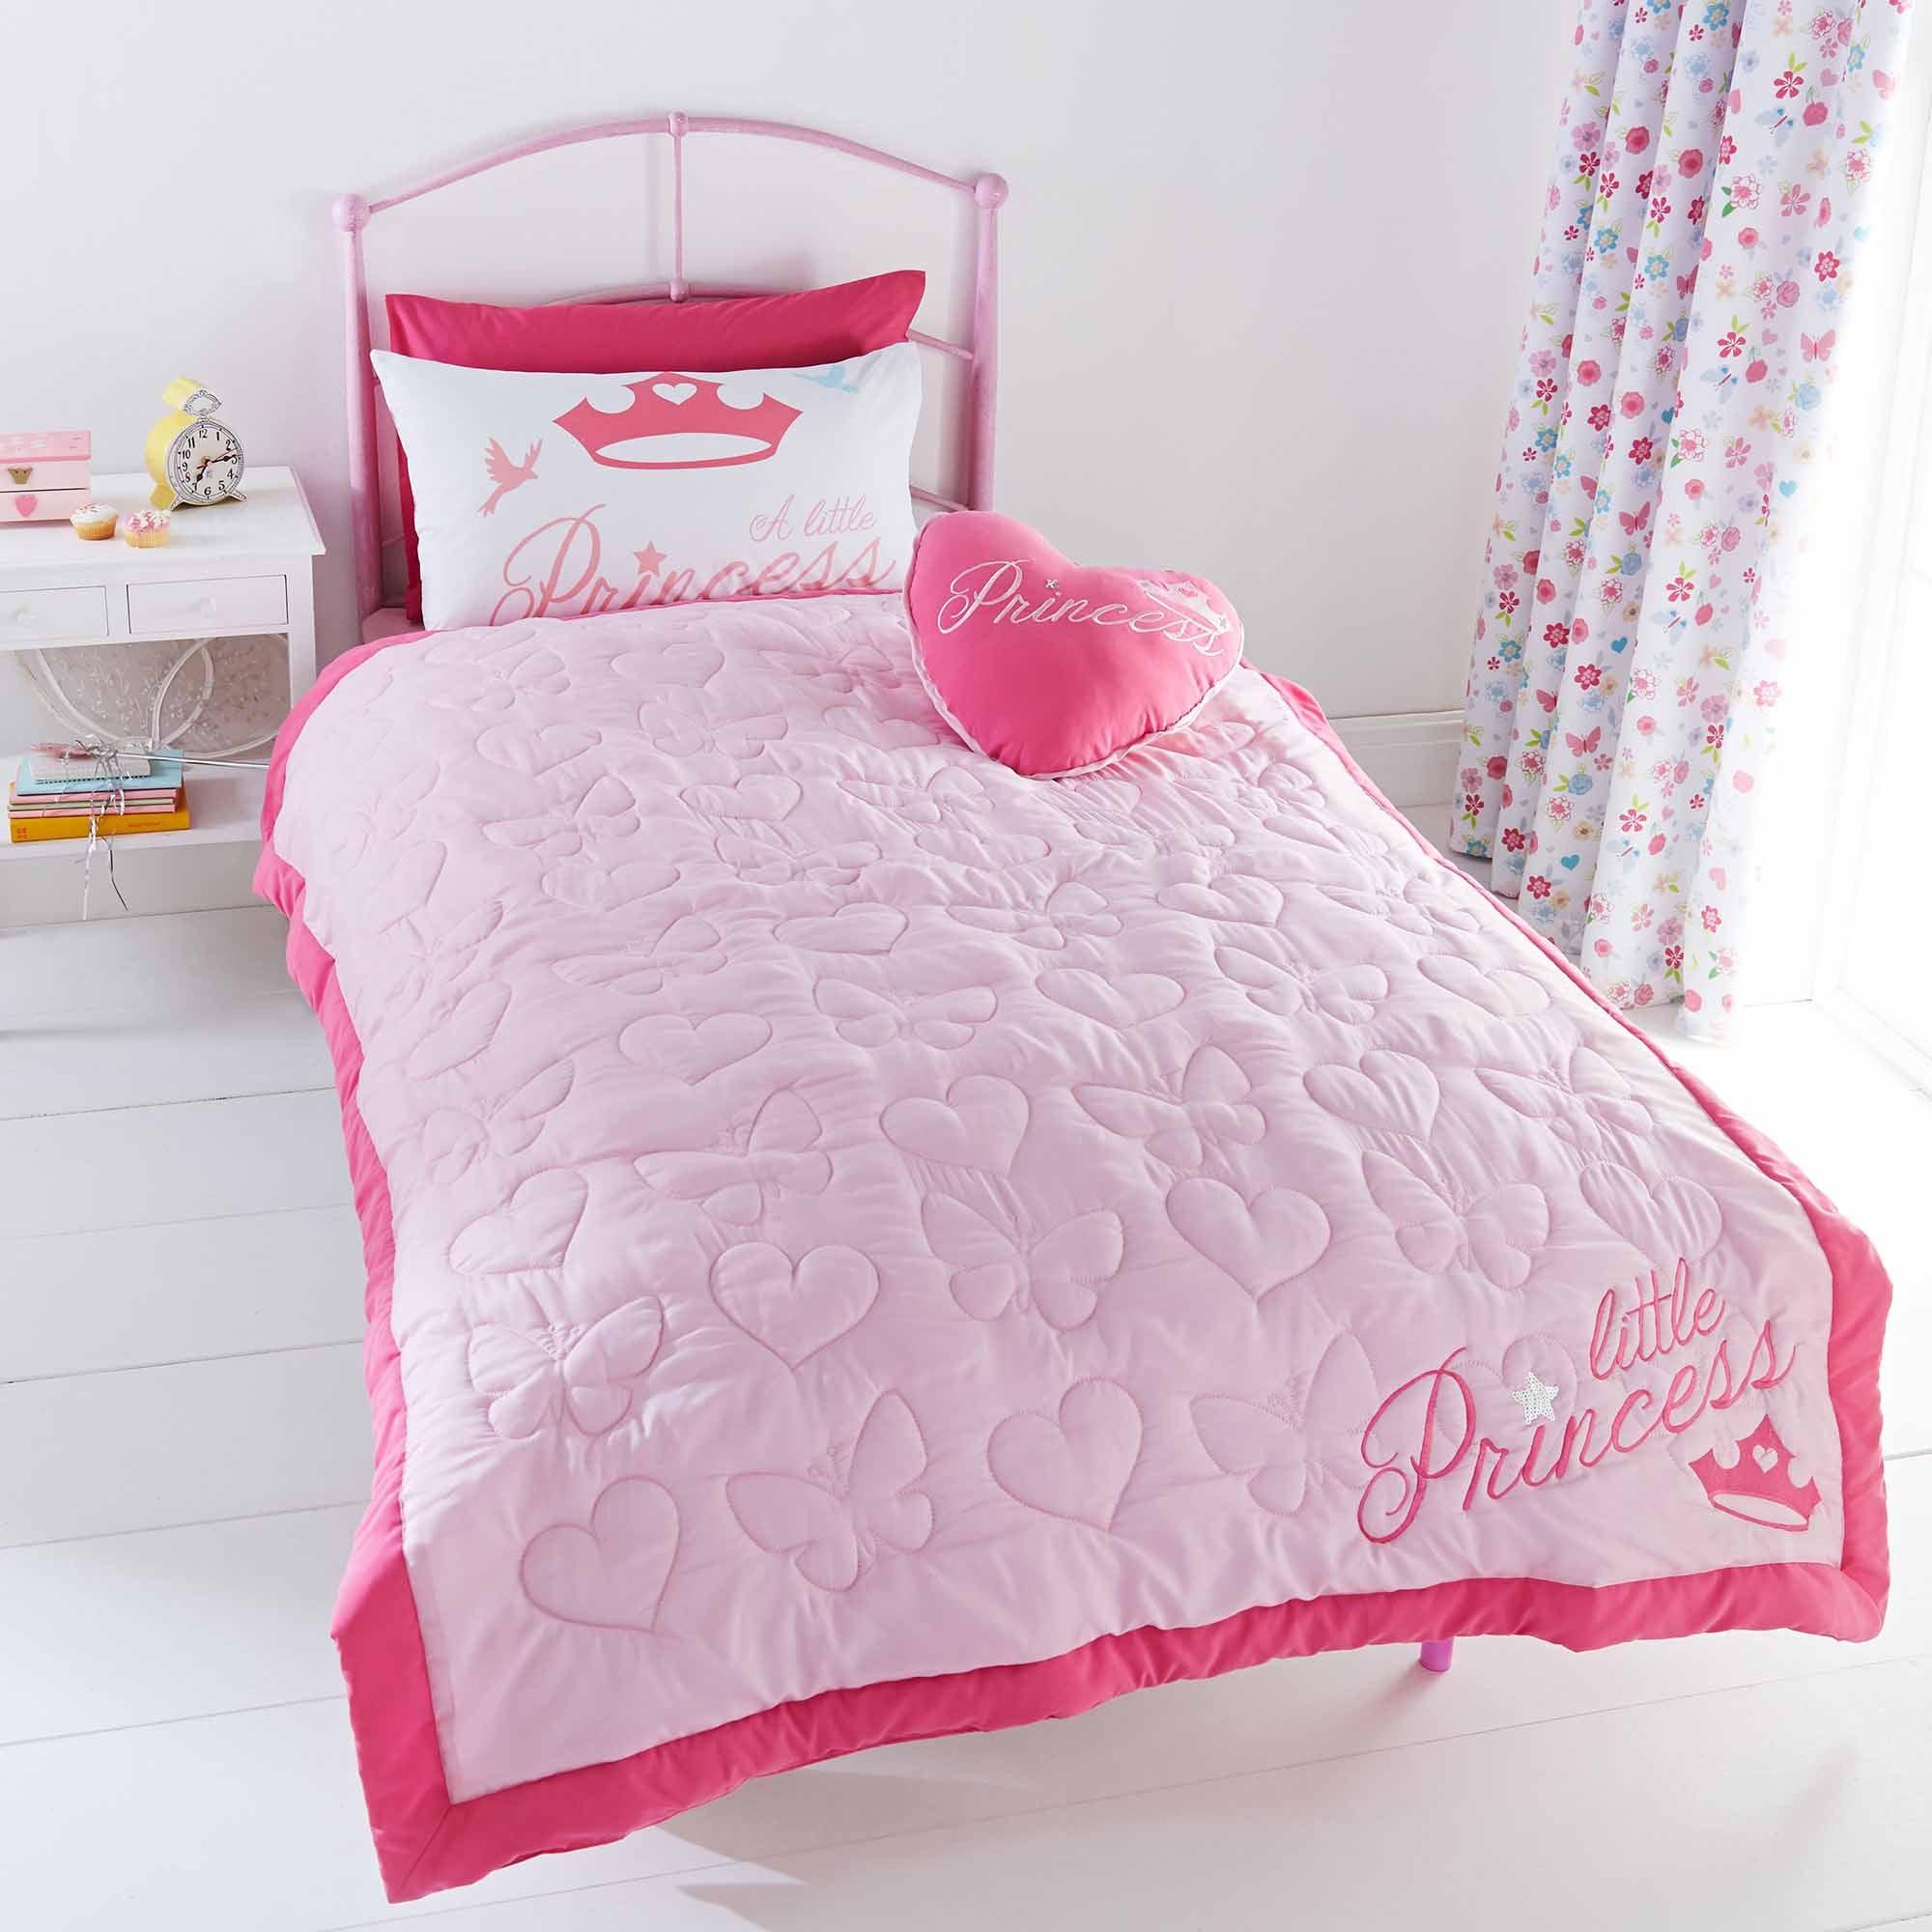 Disney Princess Bedspread Pink  White